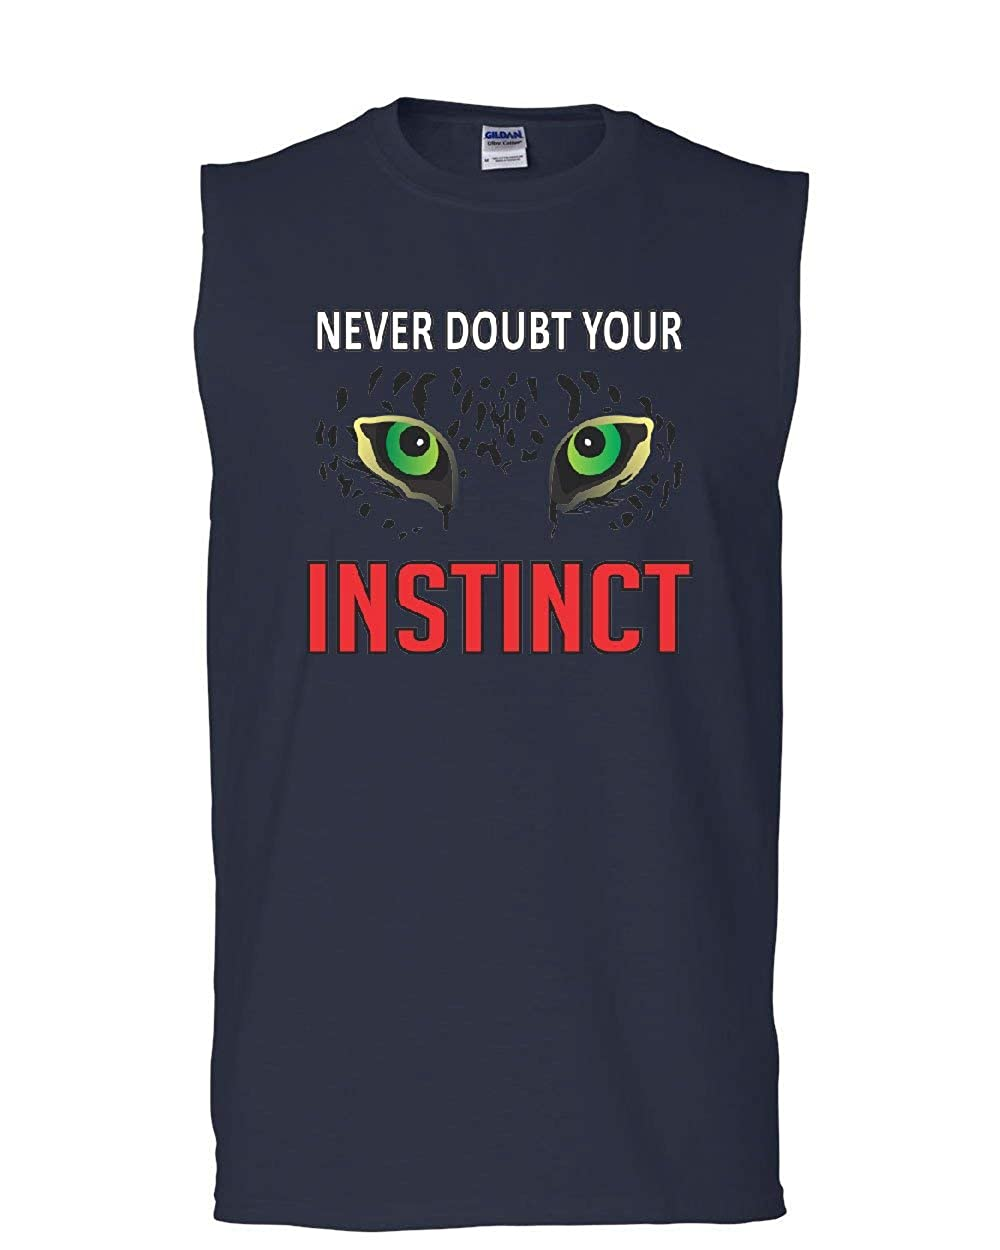 Never Doubt Your Instinct Muscle Shirt Motivation Inspiration Nature Sleeveless